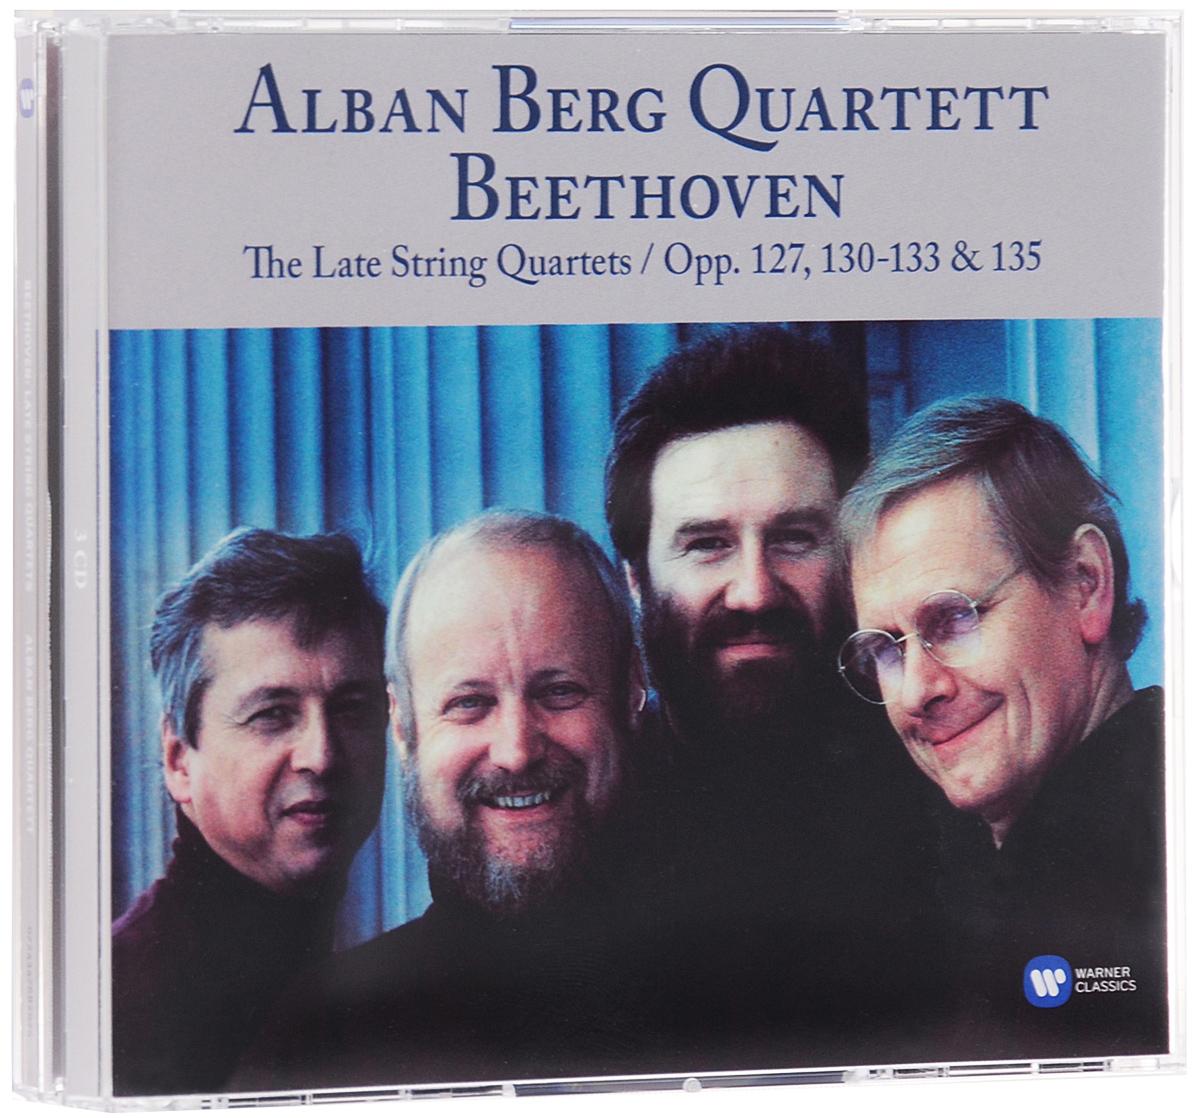 Alban Berg Quartet,Гюнтер Пичлер,Герхард Шульц,Томас Какуска,Валентин Эрбен Alban Berg Quartett. Beethoven. The Late String Quartets. Opp. 127, 130, 131, 132, 133 & 135 (3 CD) c a gibbs string quartet no 3 in e minor op 18